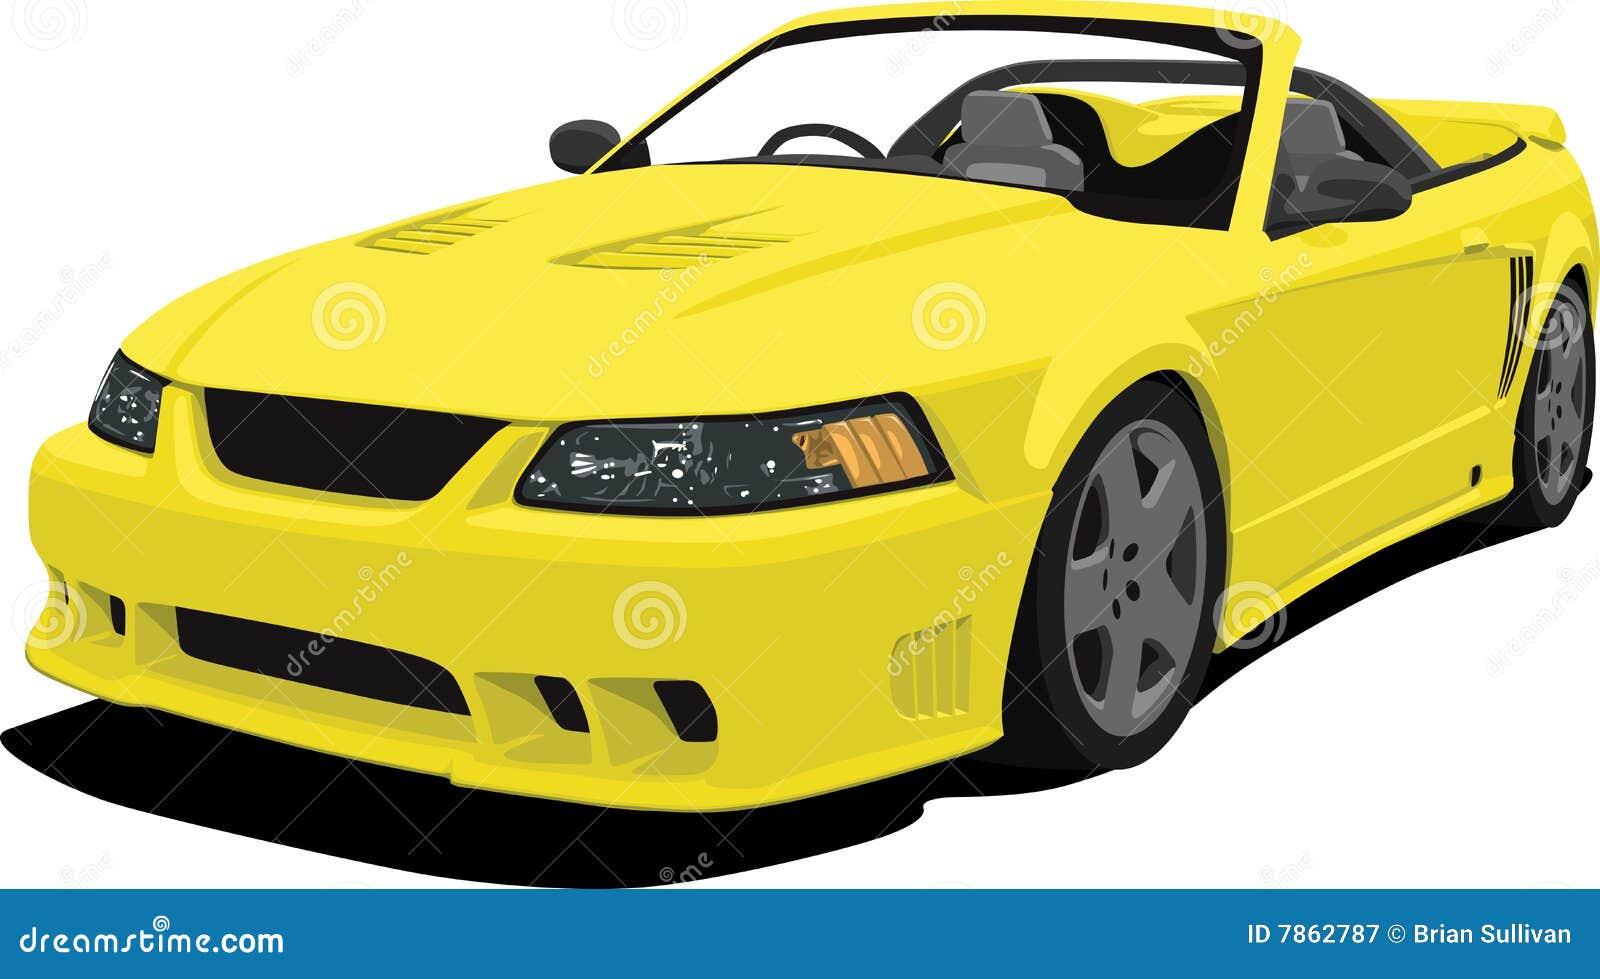 Yellow Mustang Convertible Sports Car Royalty Free Stock